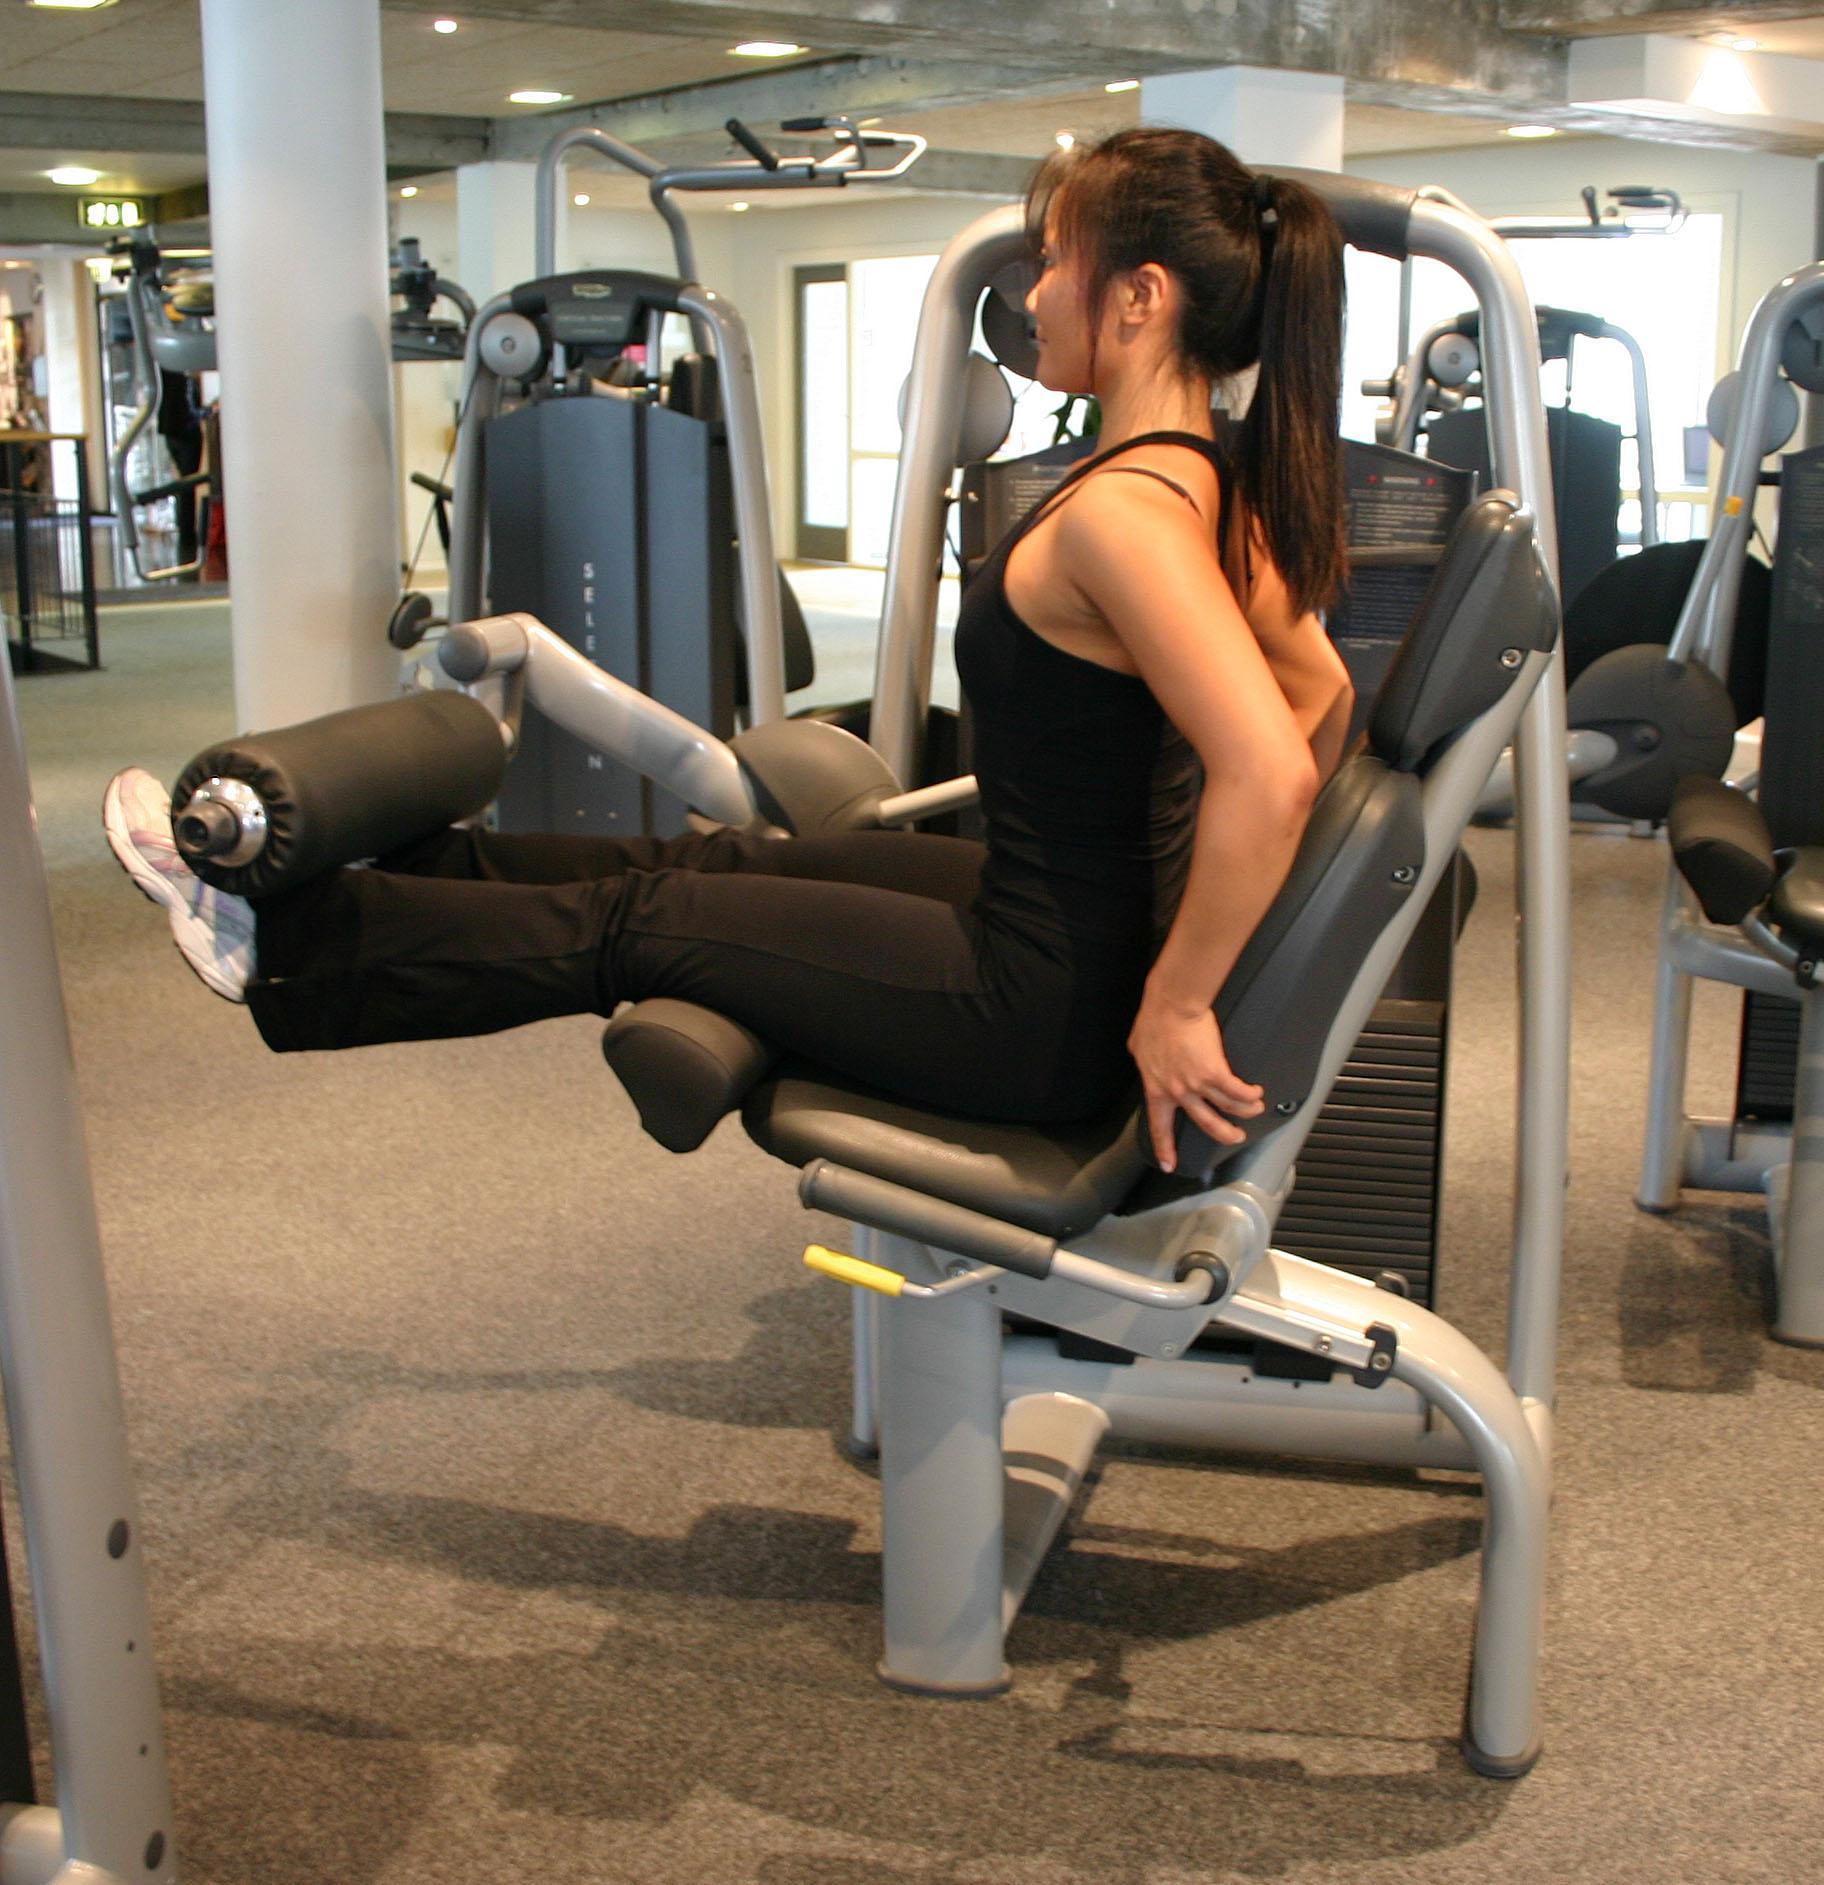 Bentraening_i_fitnessmaskine